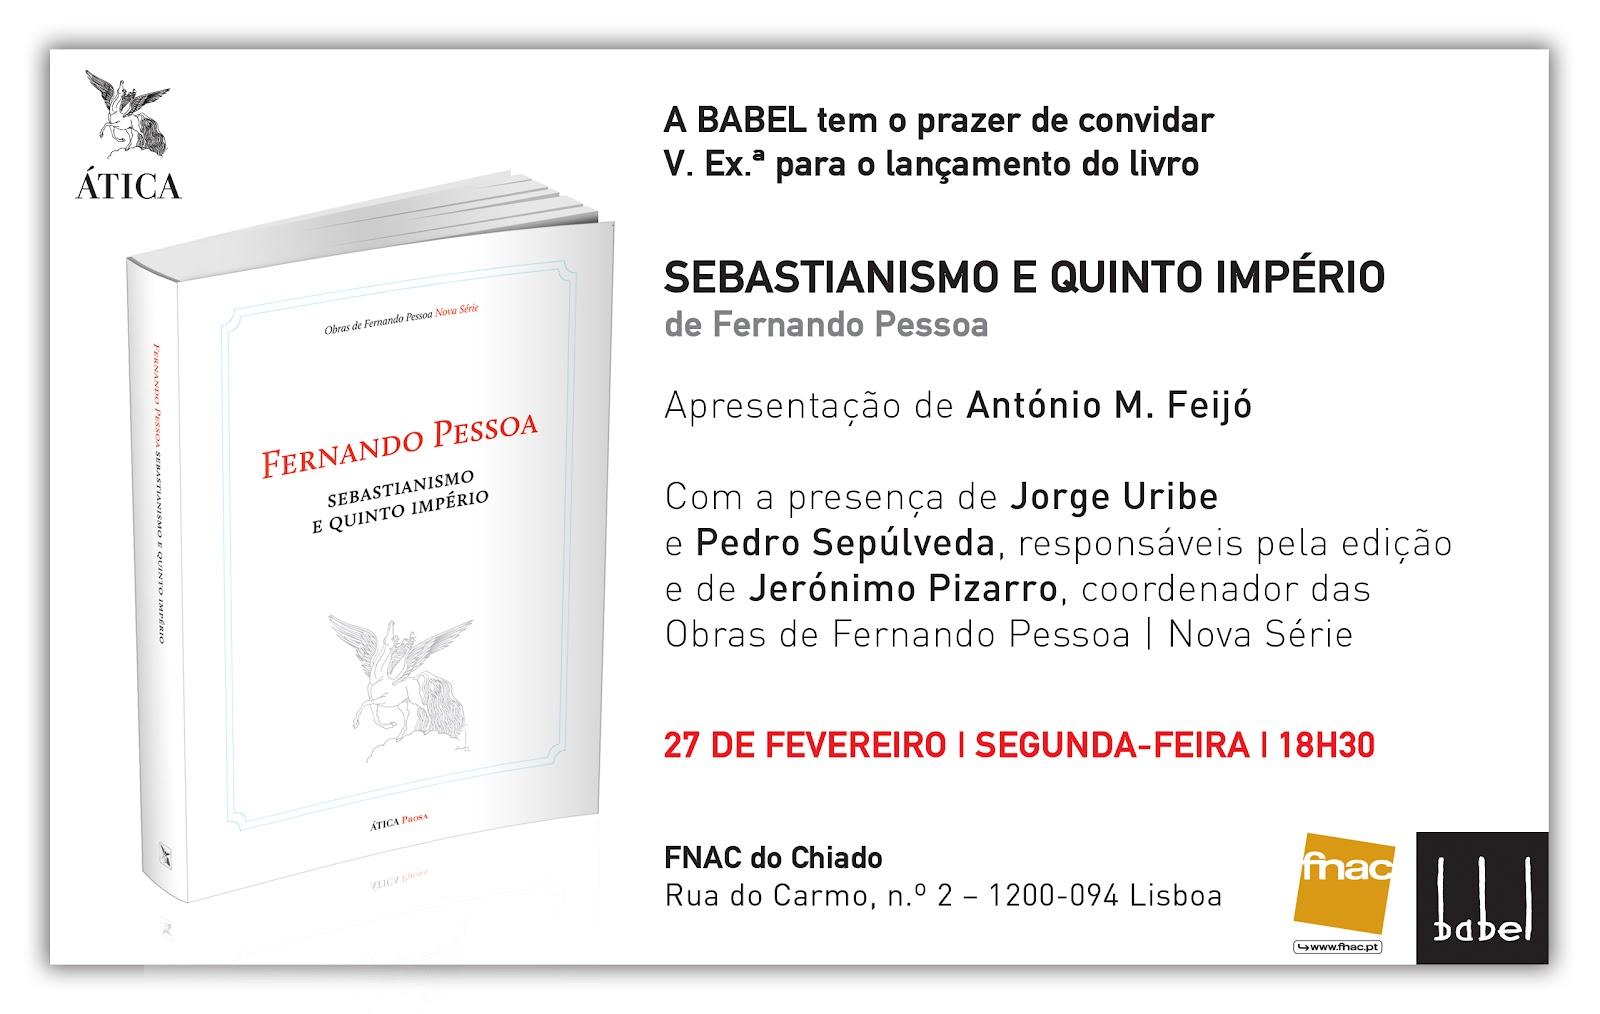 http://1.bp.blogspot.com/-rB4PNHWrD9Y/T0T67lgVwRI/AAAAAAAACZE/ZLkRd23c_G4/s1600/Convite_Sebastianismo.jpg